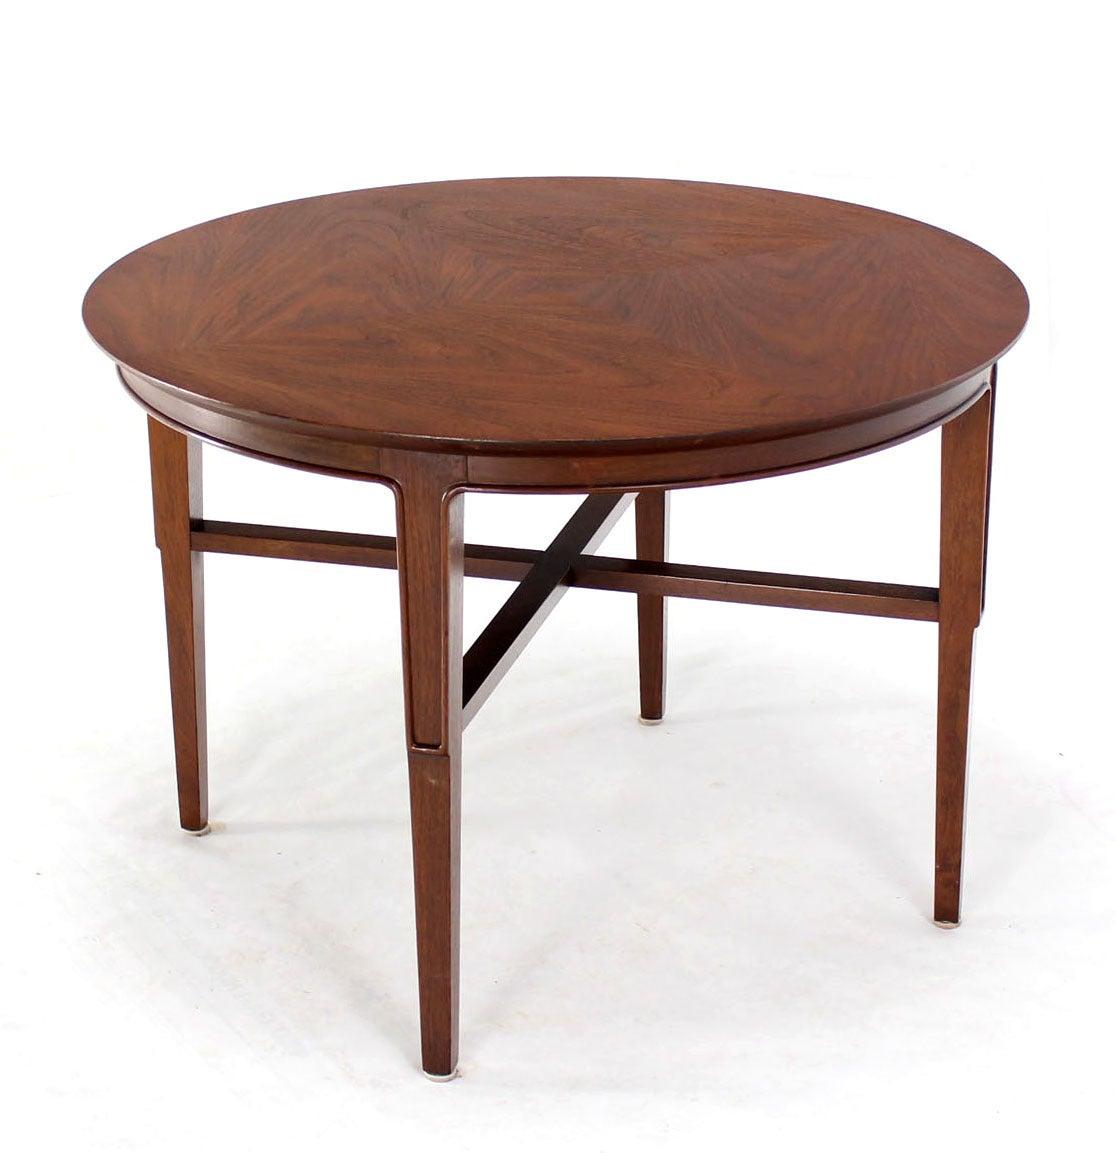 Mid Century Modern Small Round Coffee Table At 1stdibs: John Stuart Mid-Century Modern Walnut Round Side Table Image 2